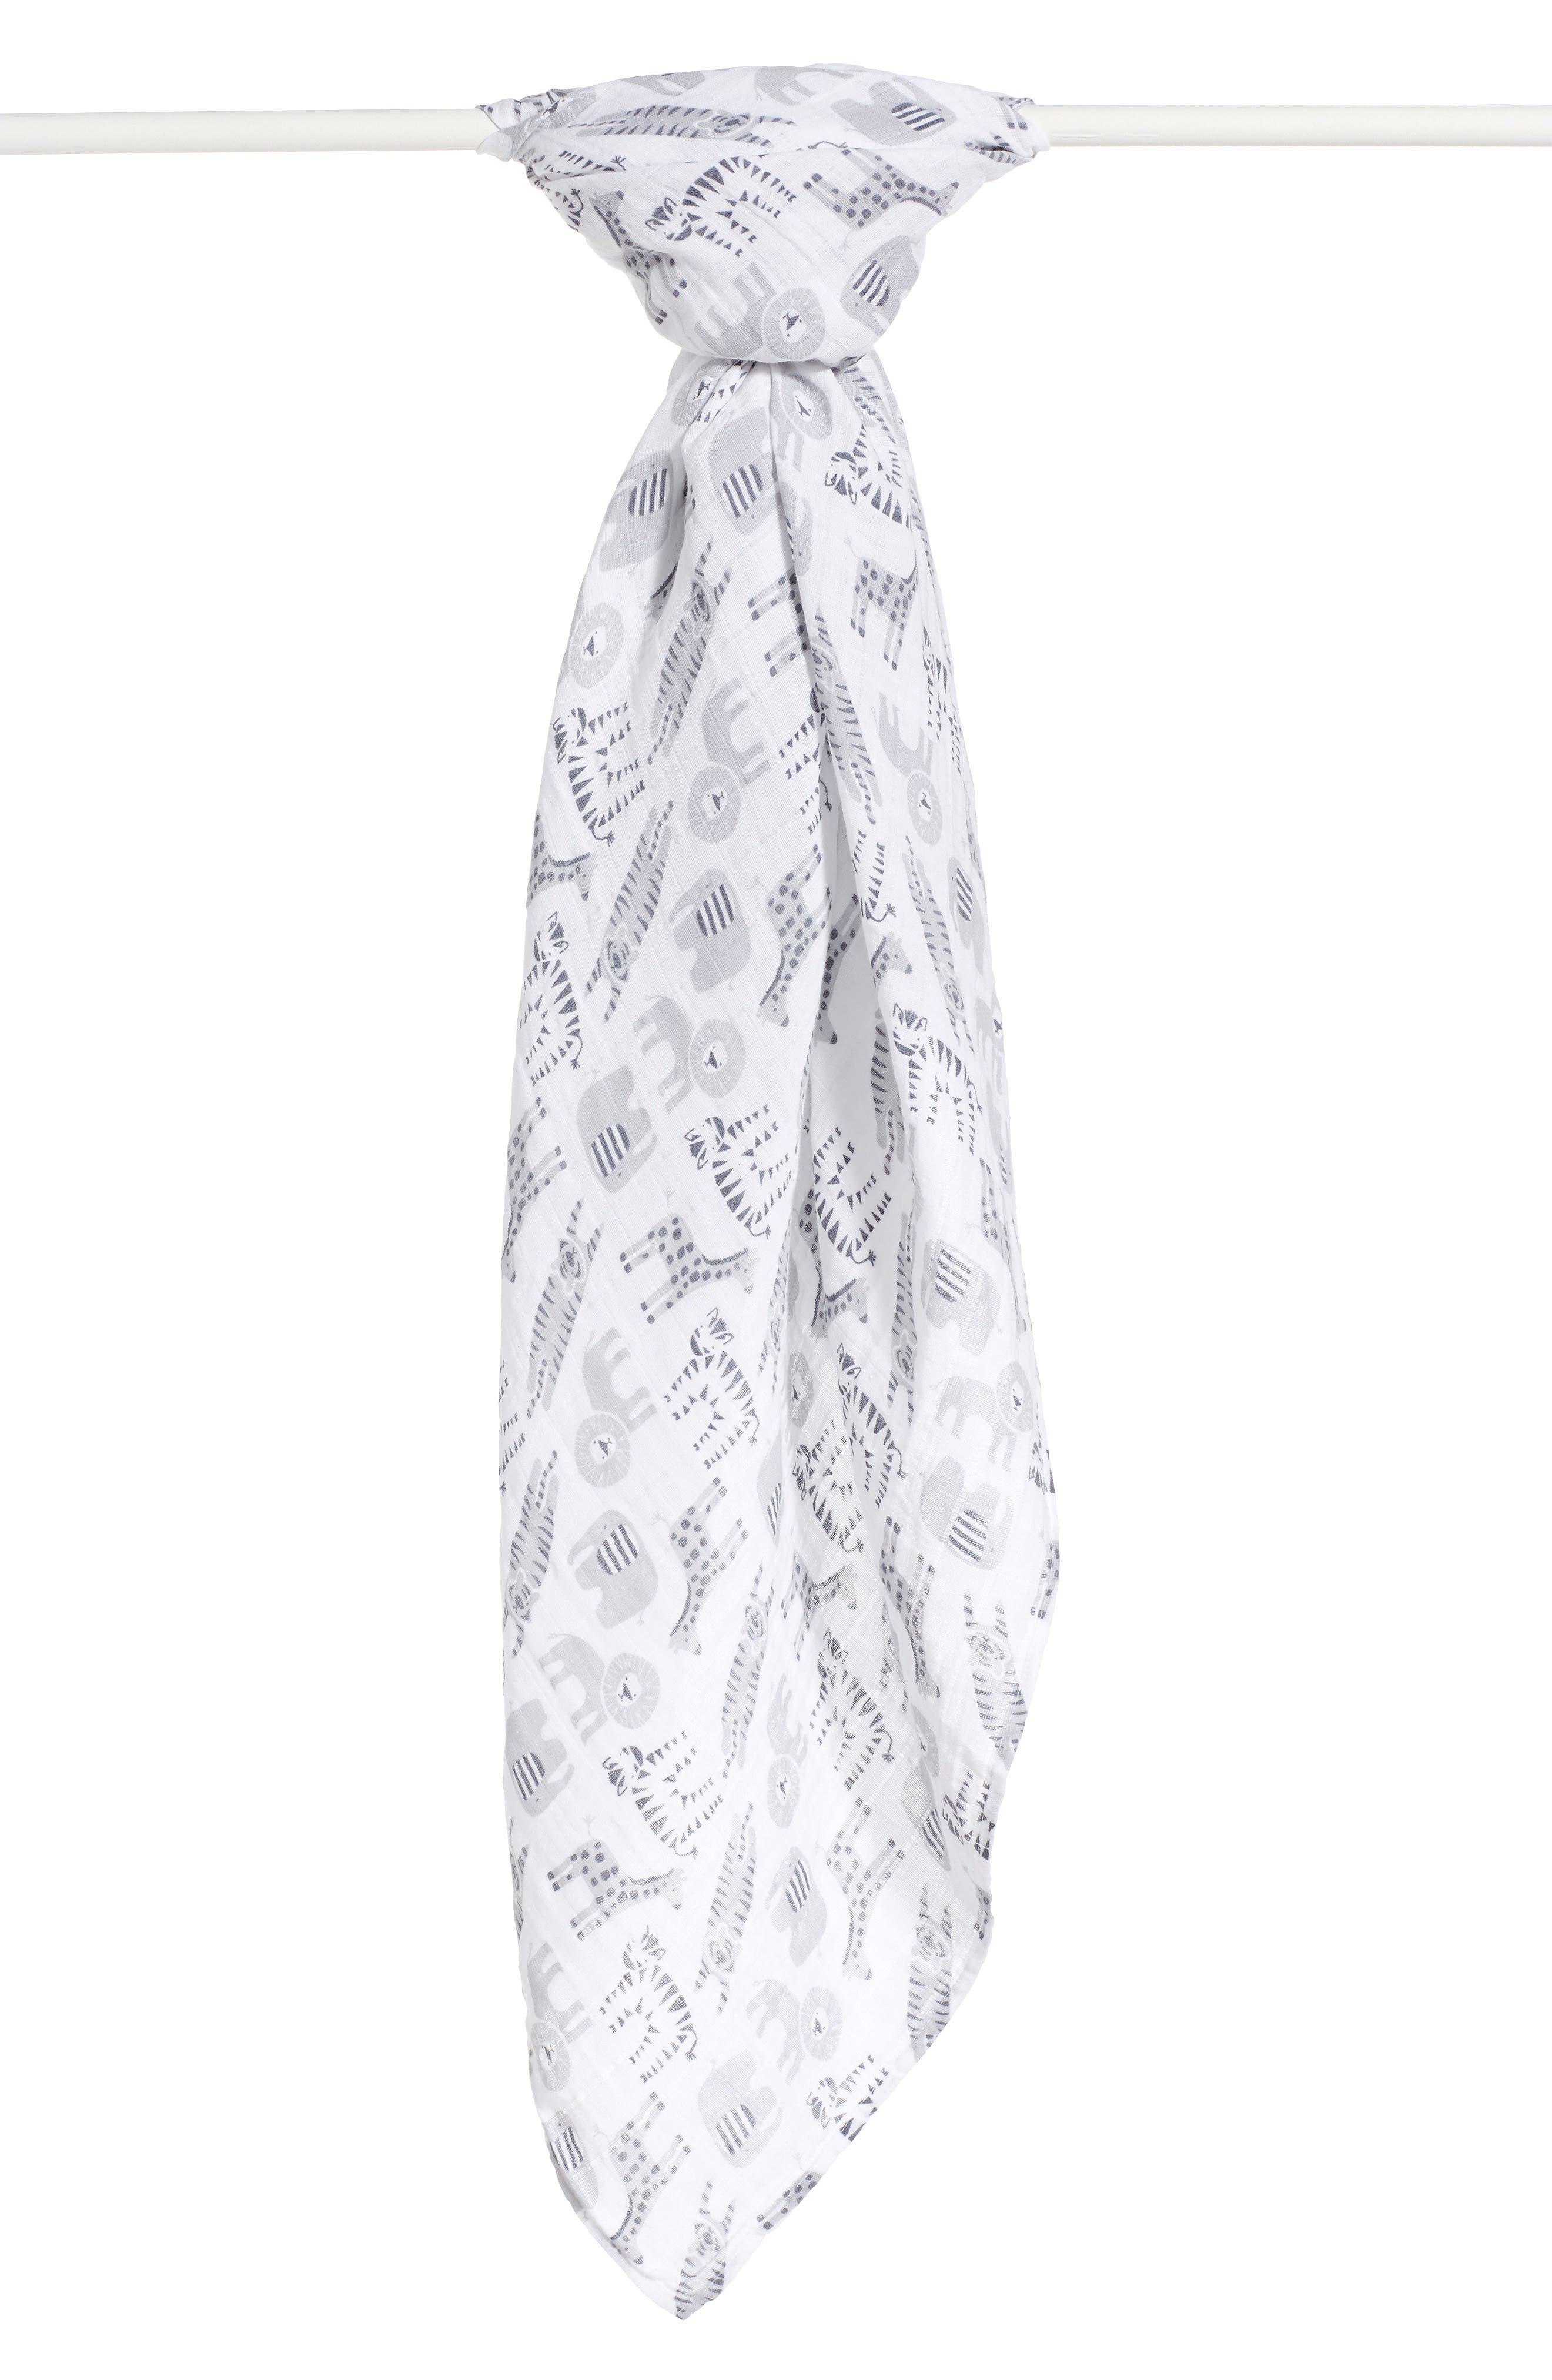 Cotton Swaddle Blanket,                             Main thumbnail 13, color,